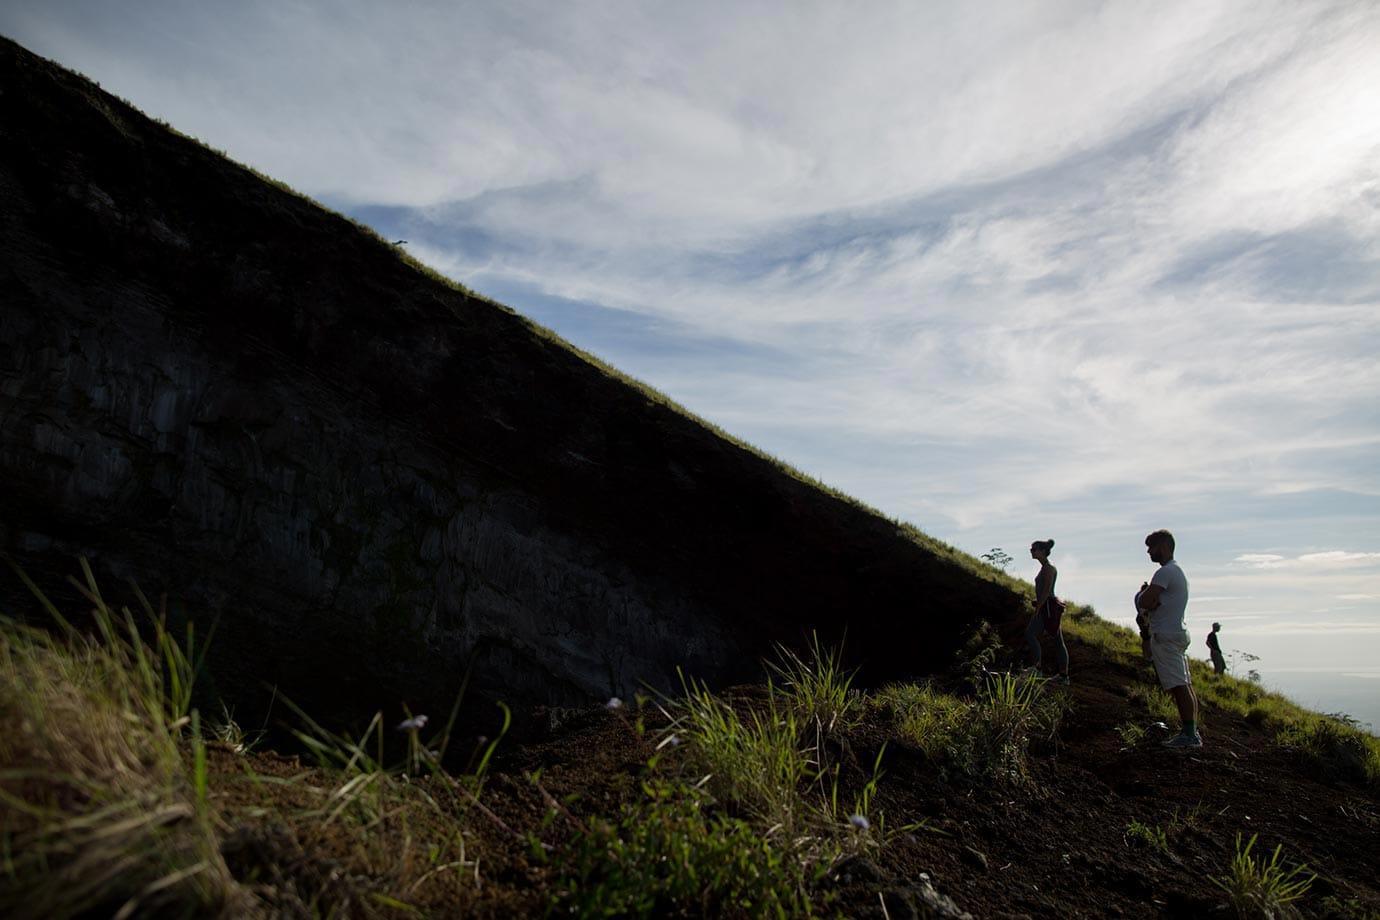 Standing by El Hoyo, Nicaragua